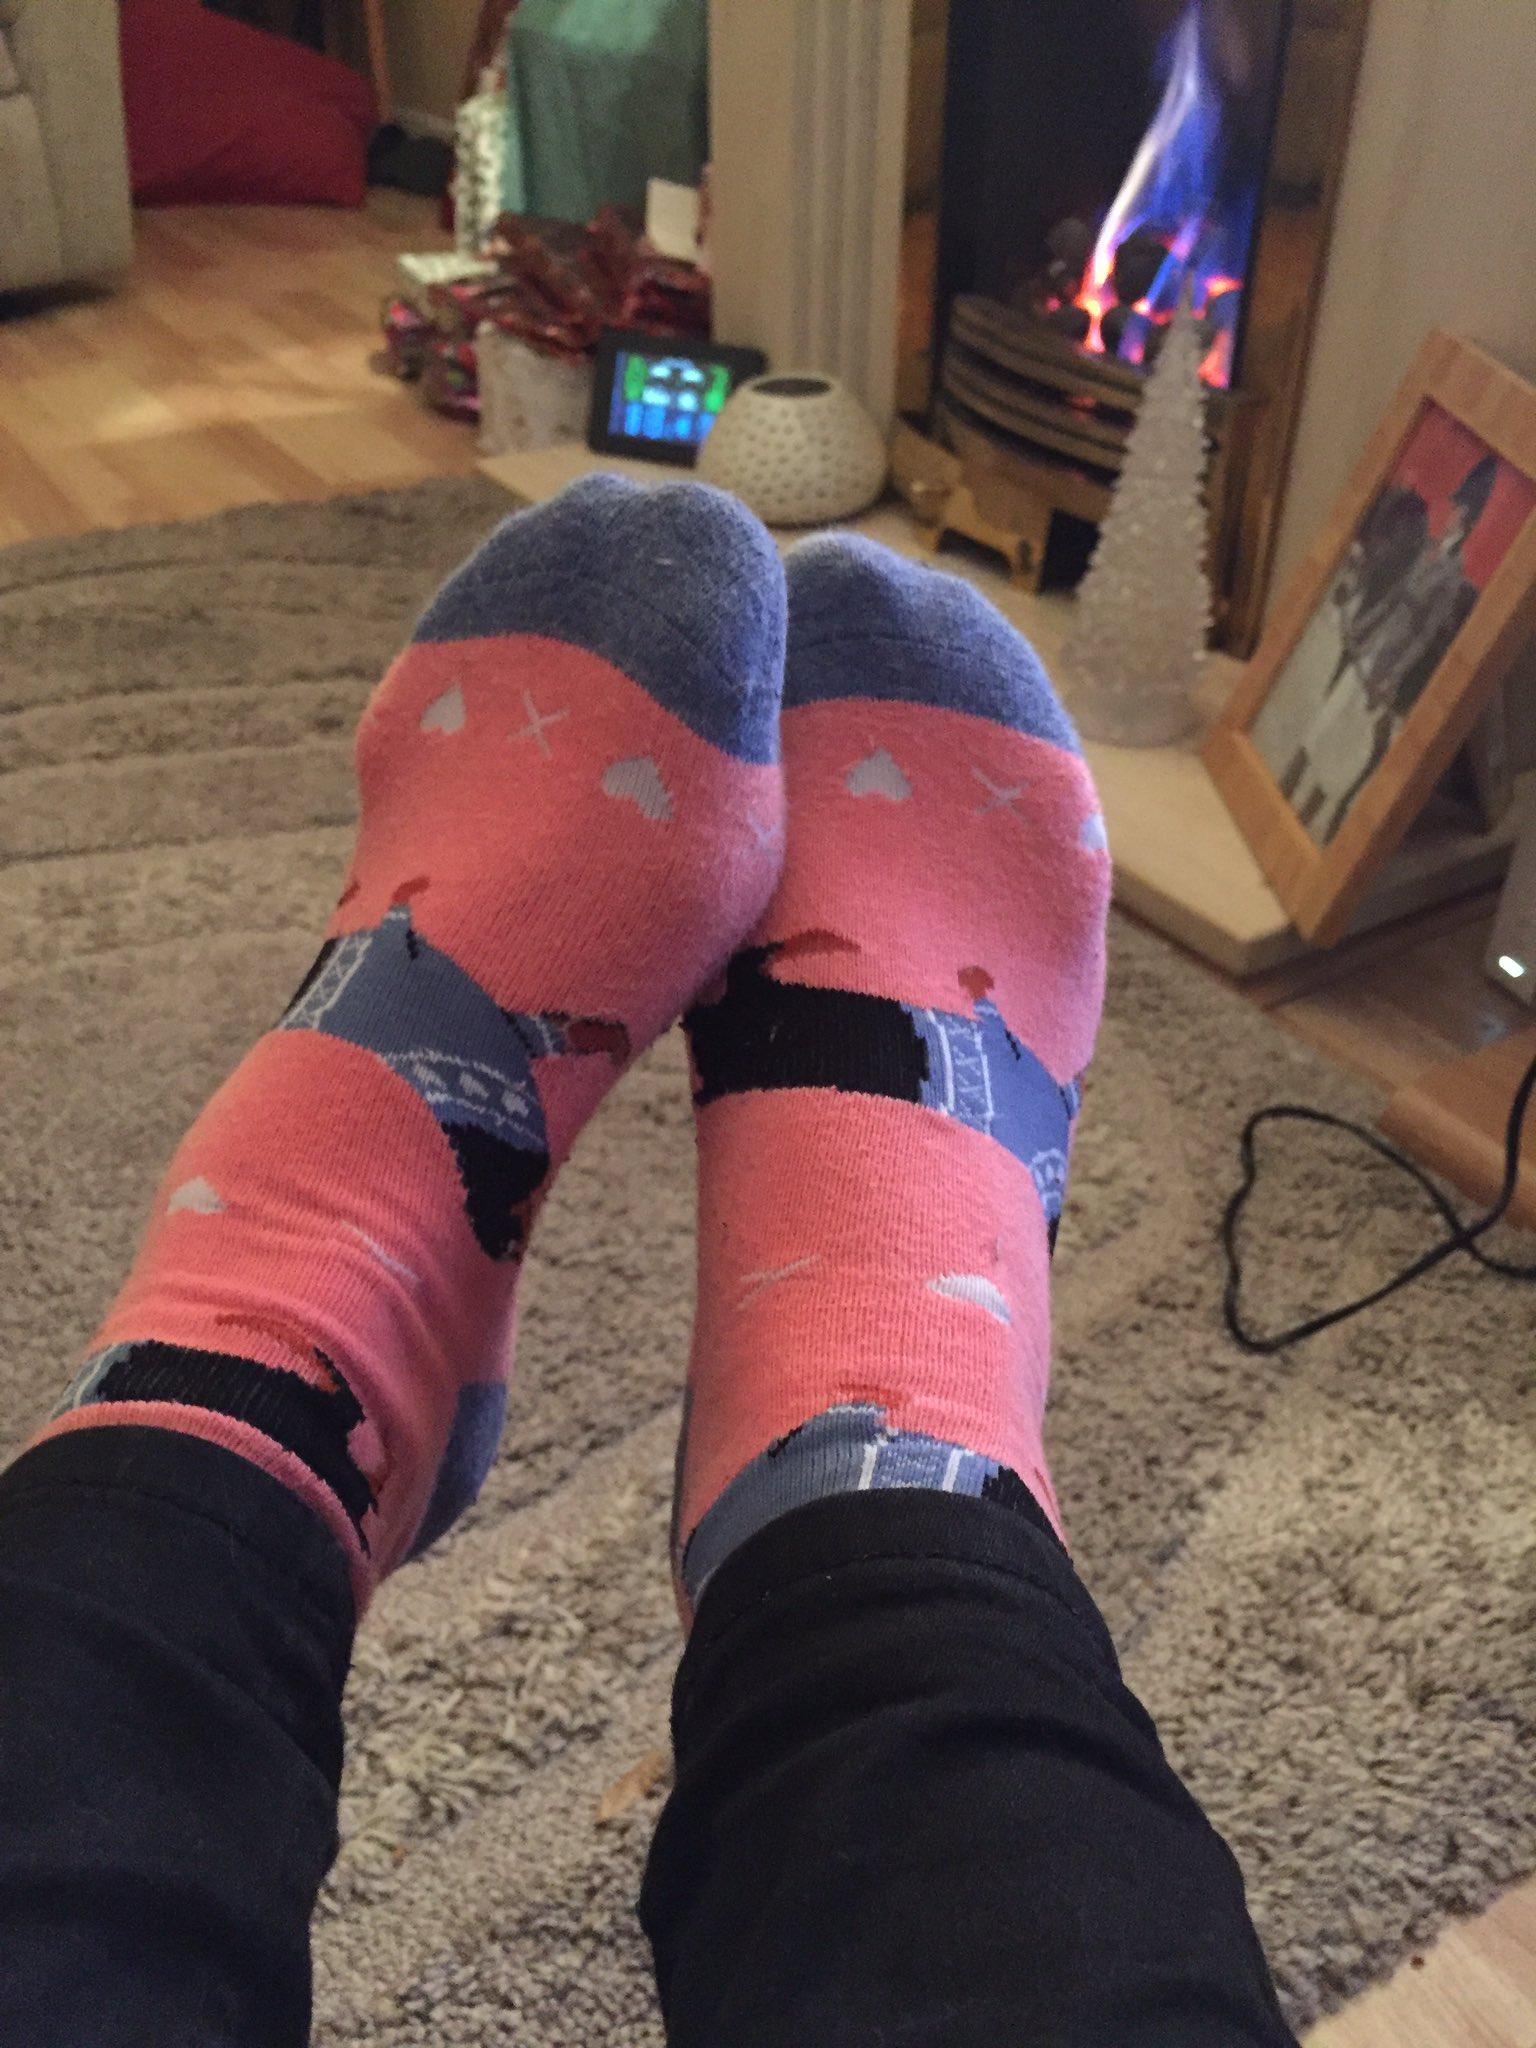 @folksy purchasing these socks! #sausagedog #folksyhour https://t.co/EB4iZiOLMw